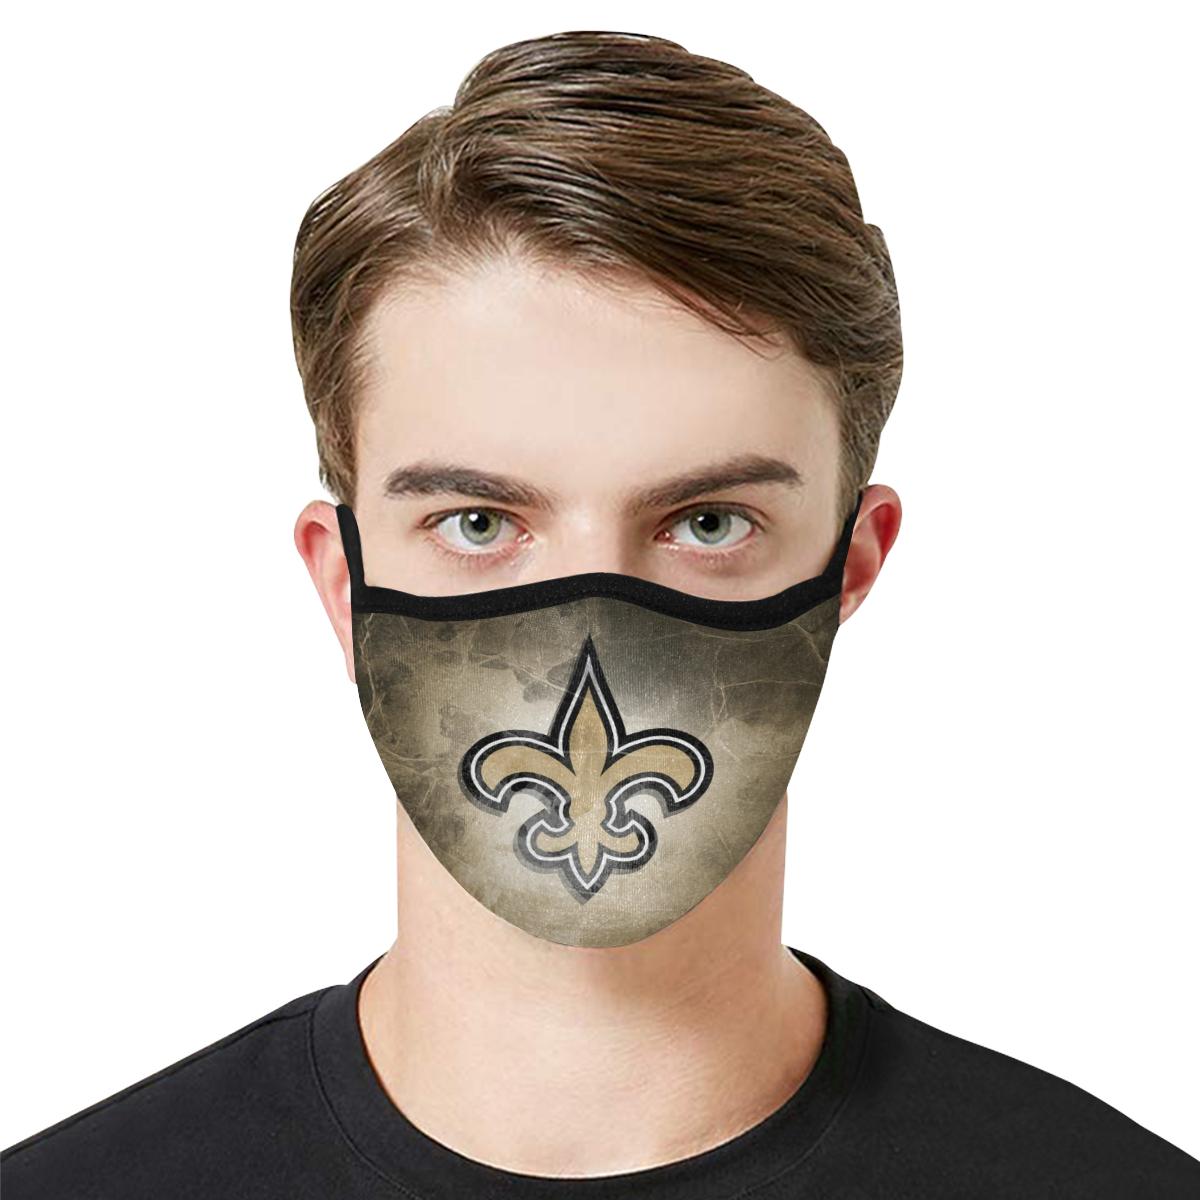 National football league new orleans saints cotton face mask 2